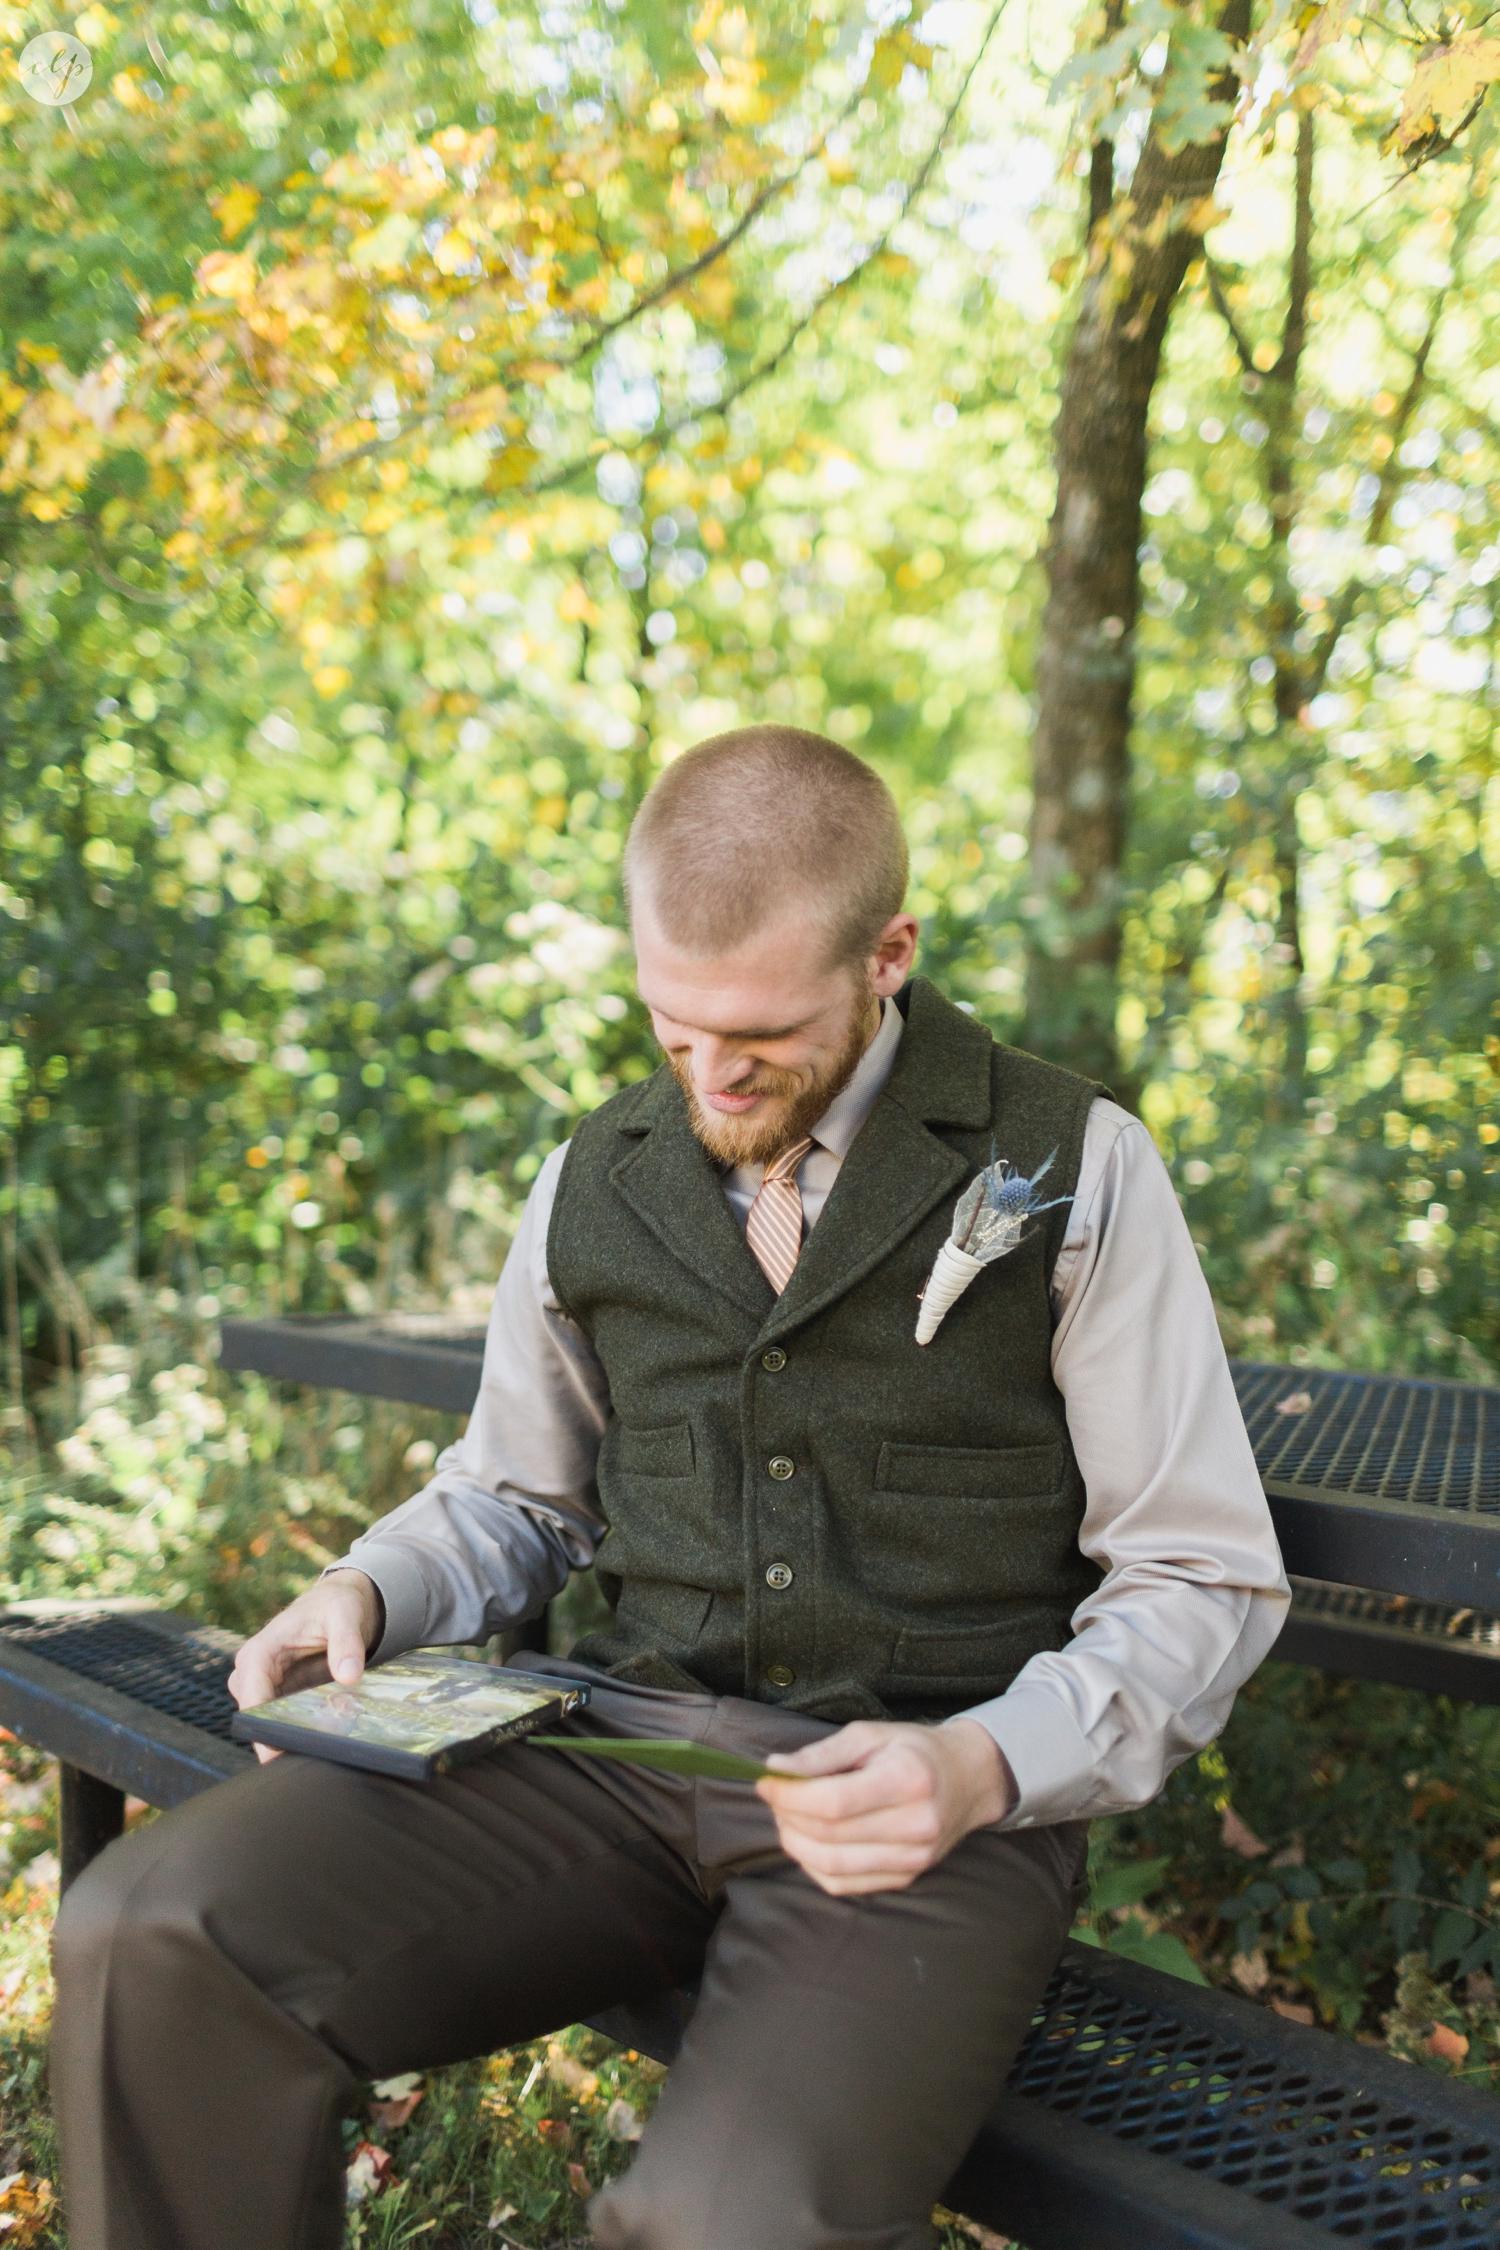 Outdoor-Wedding-in-the-Woods-Photography_4198.jpg